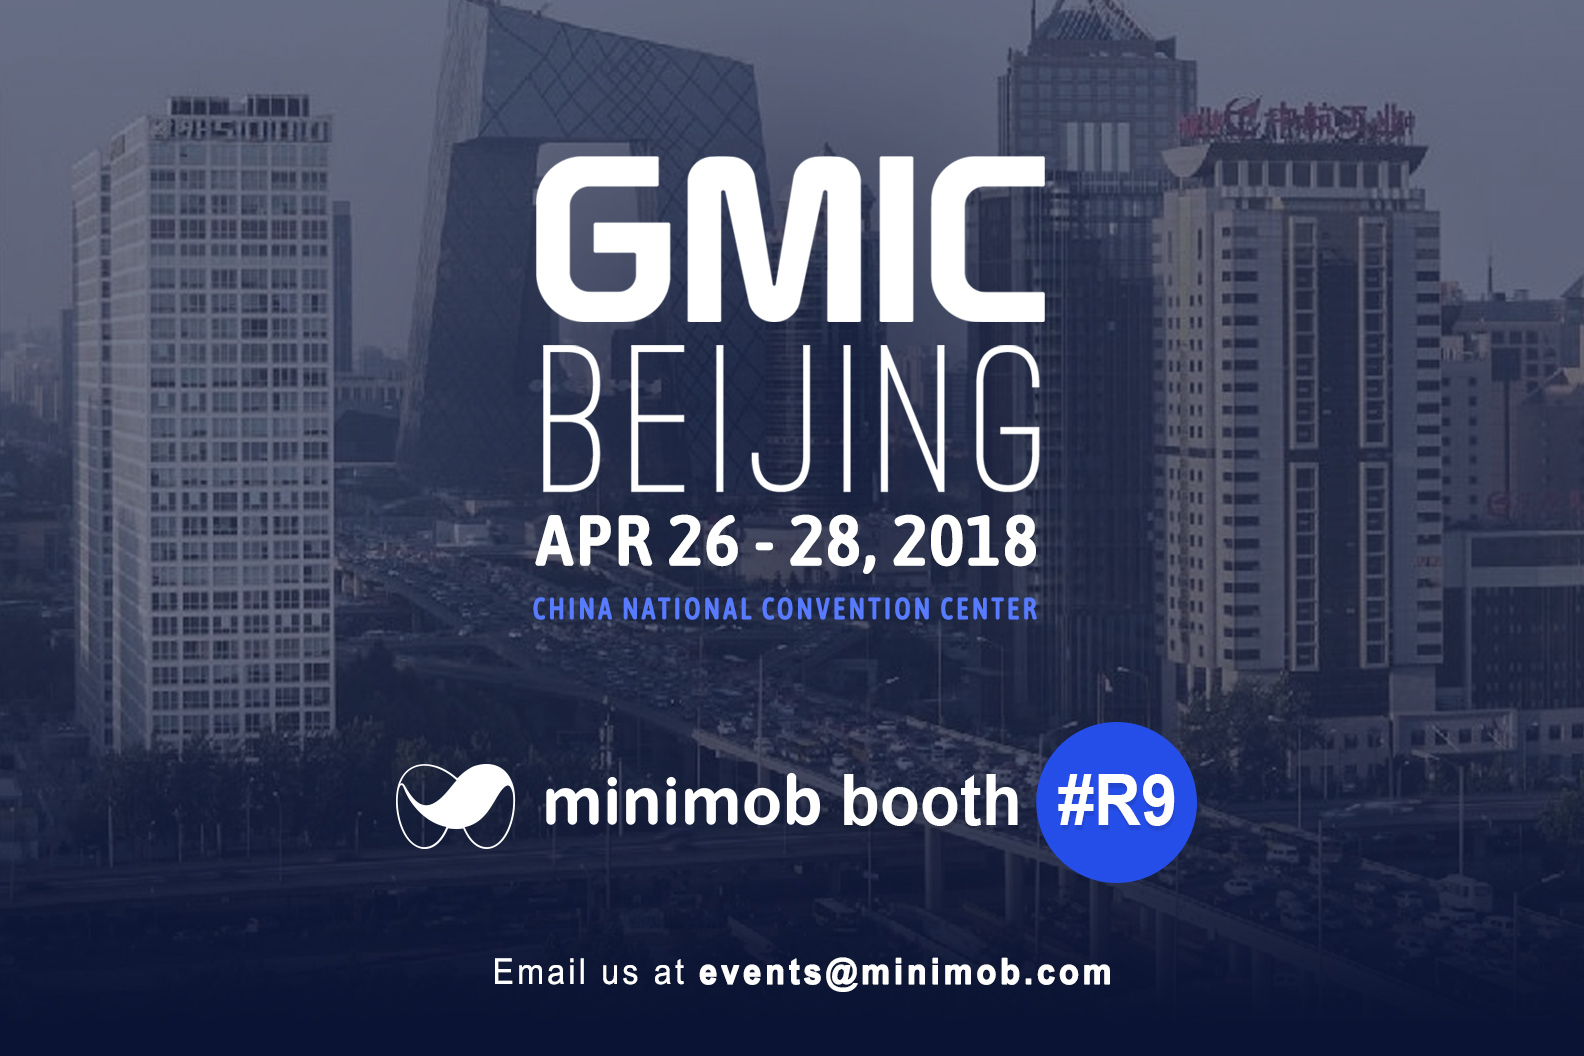 GMIC2018_linkedin_792x528_x2